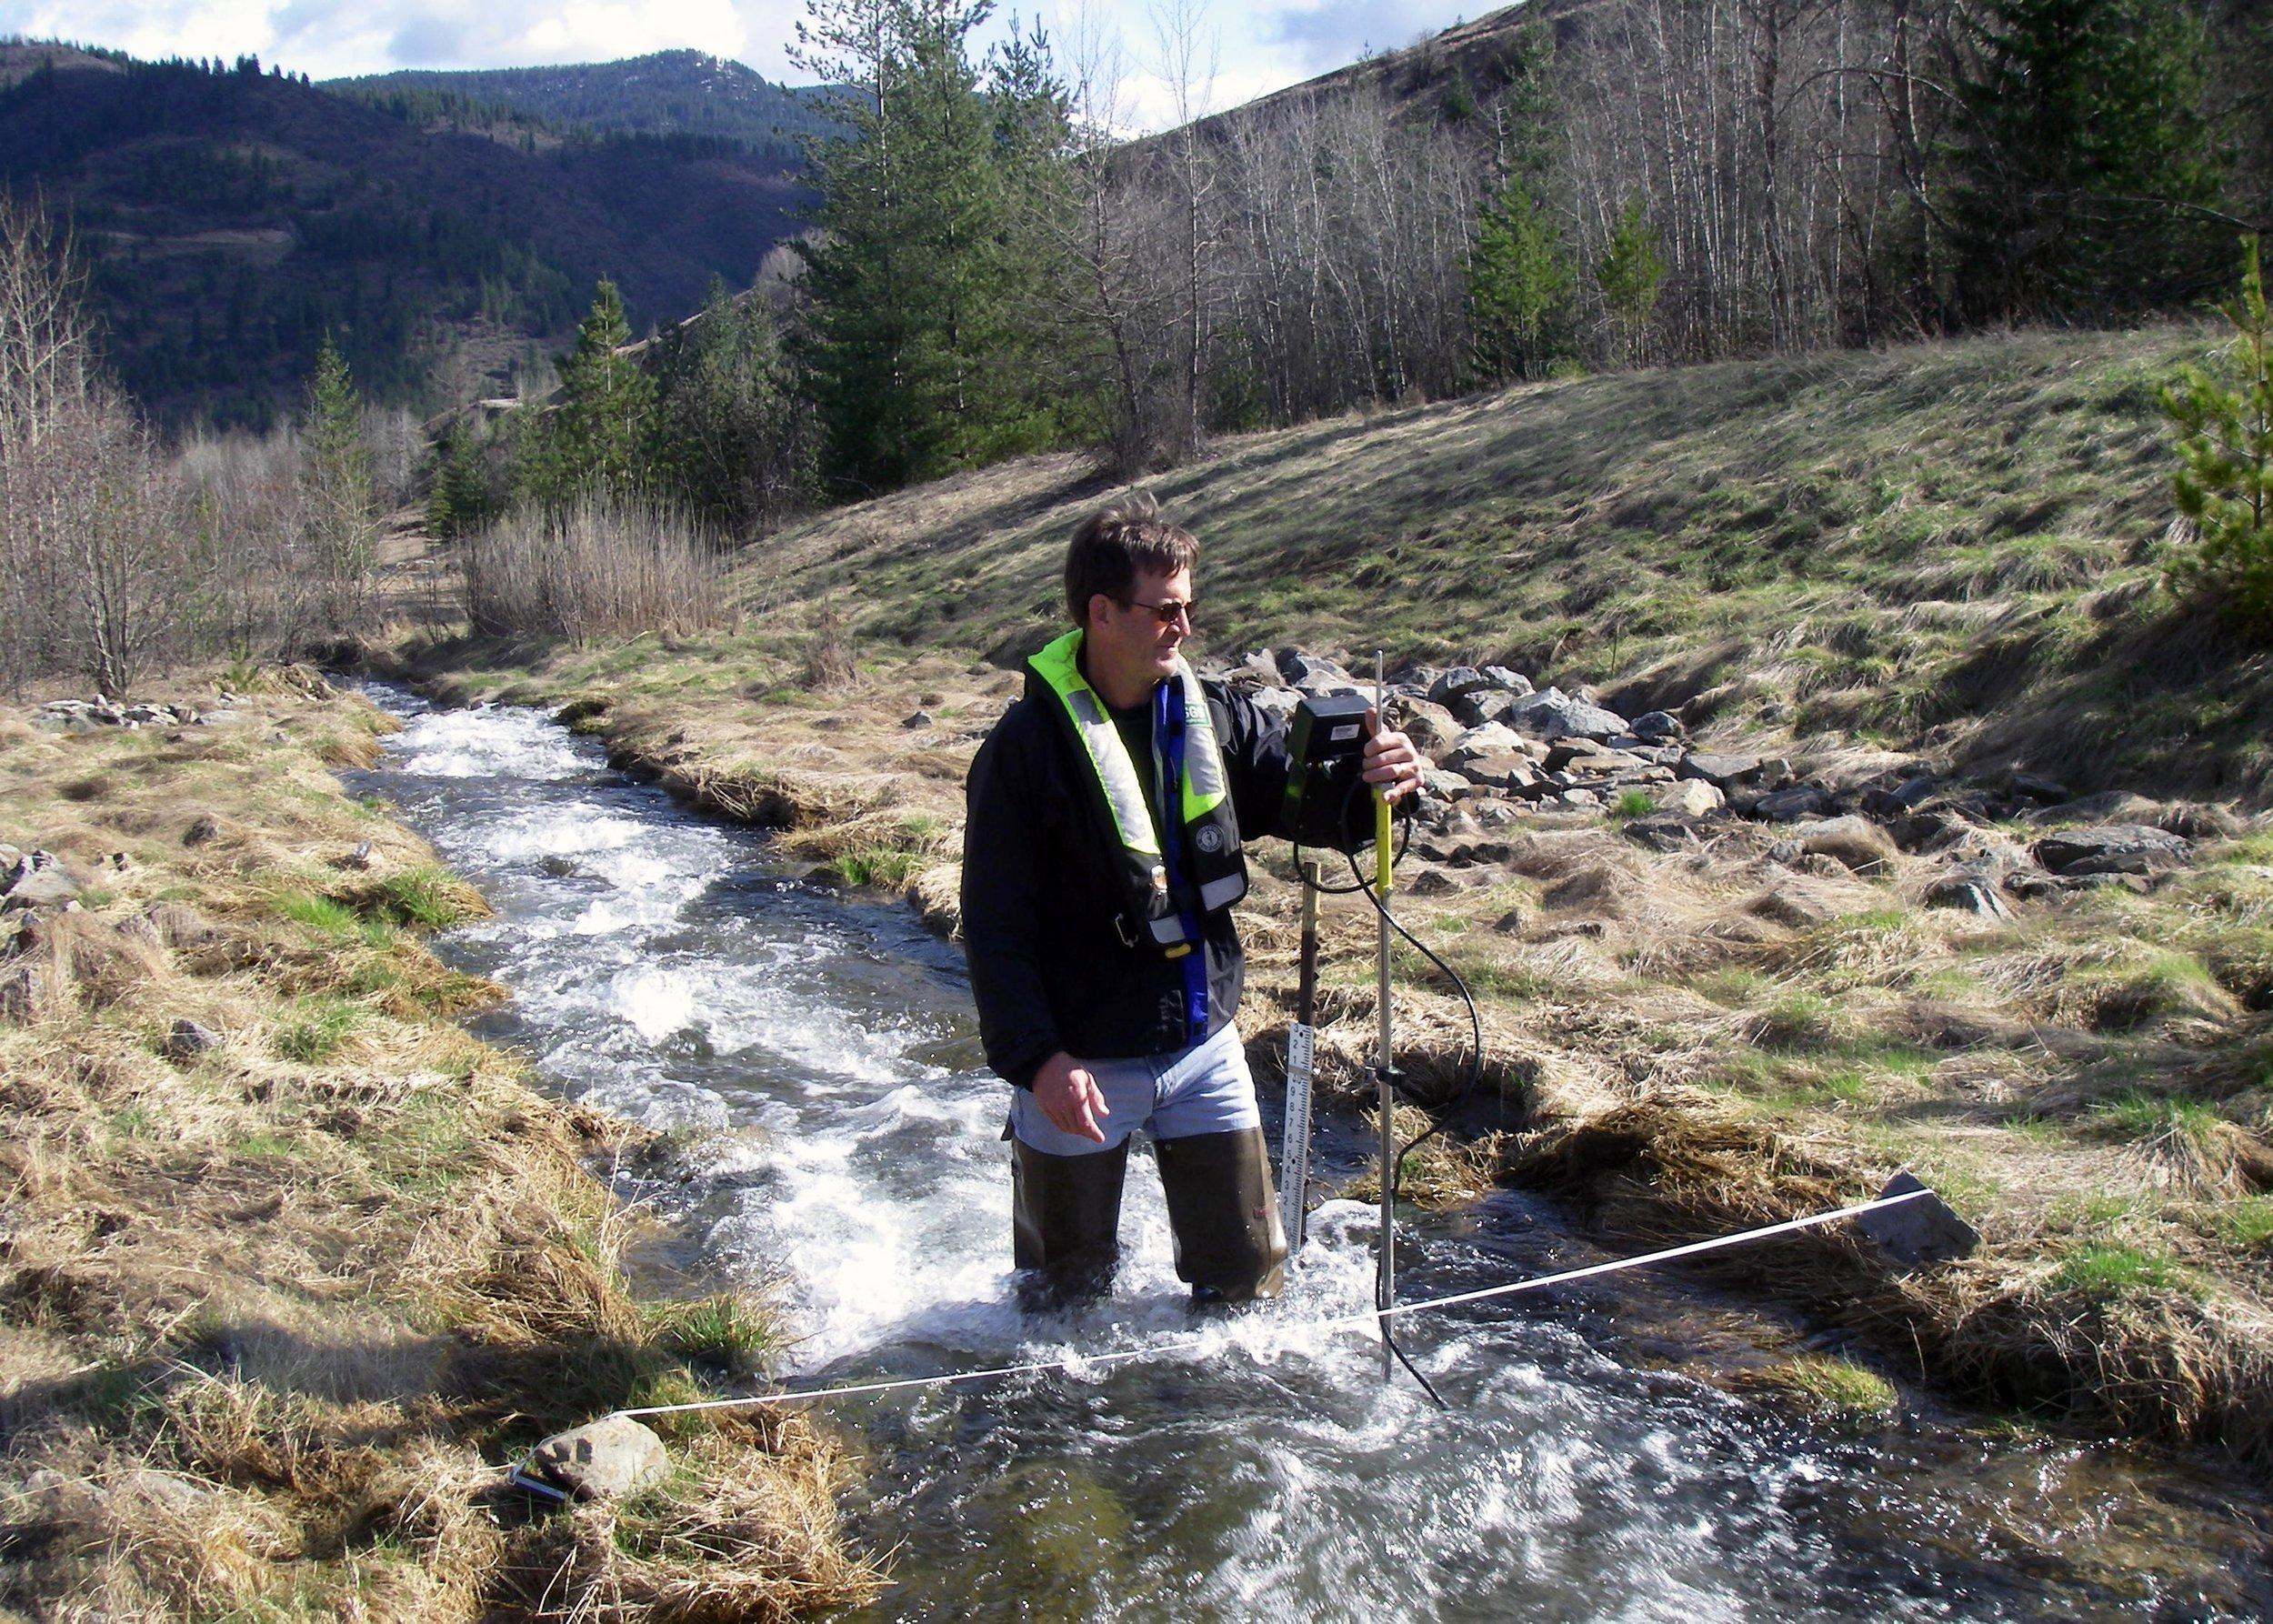 Hydrologist_Measuring_Streamflow_(15303060773).jpg